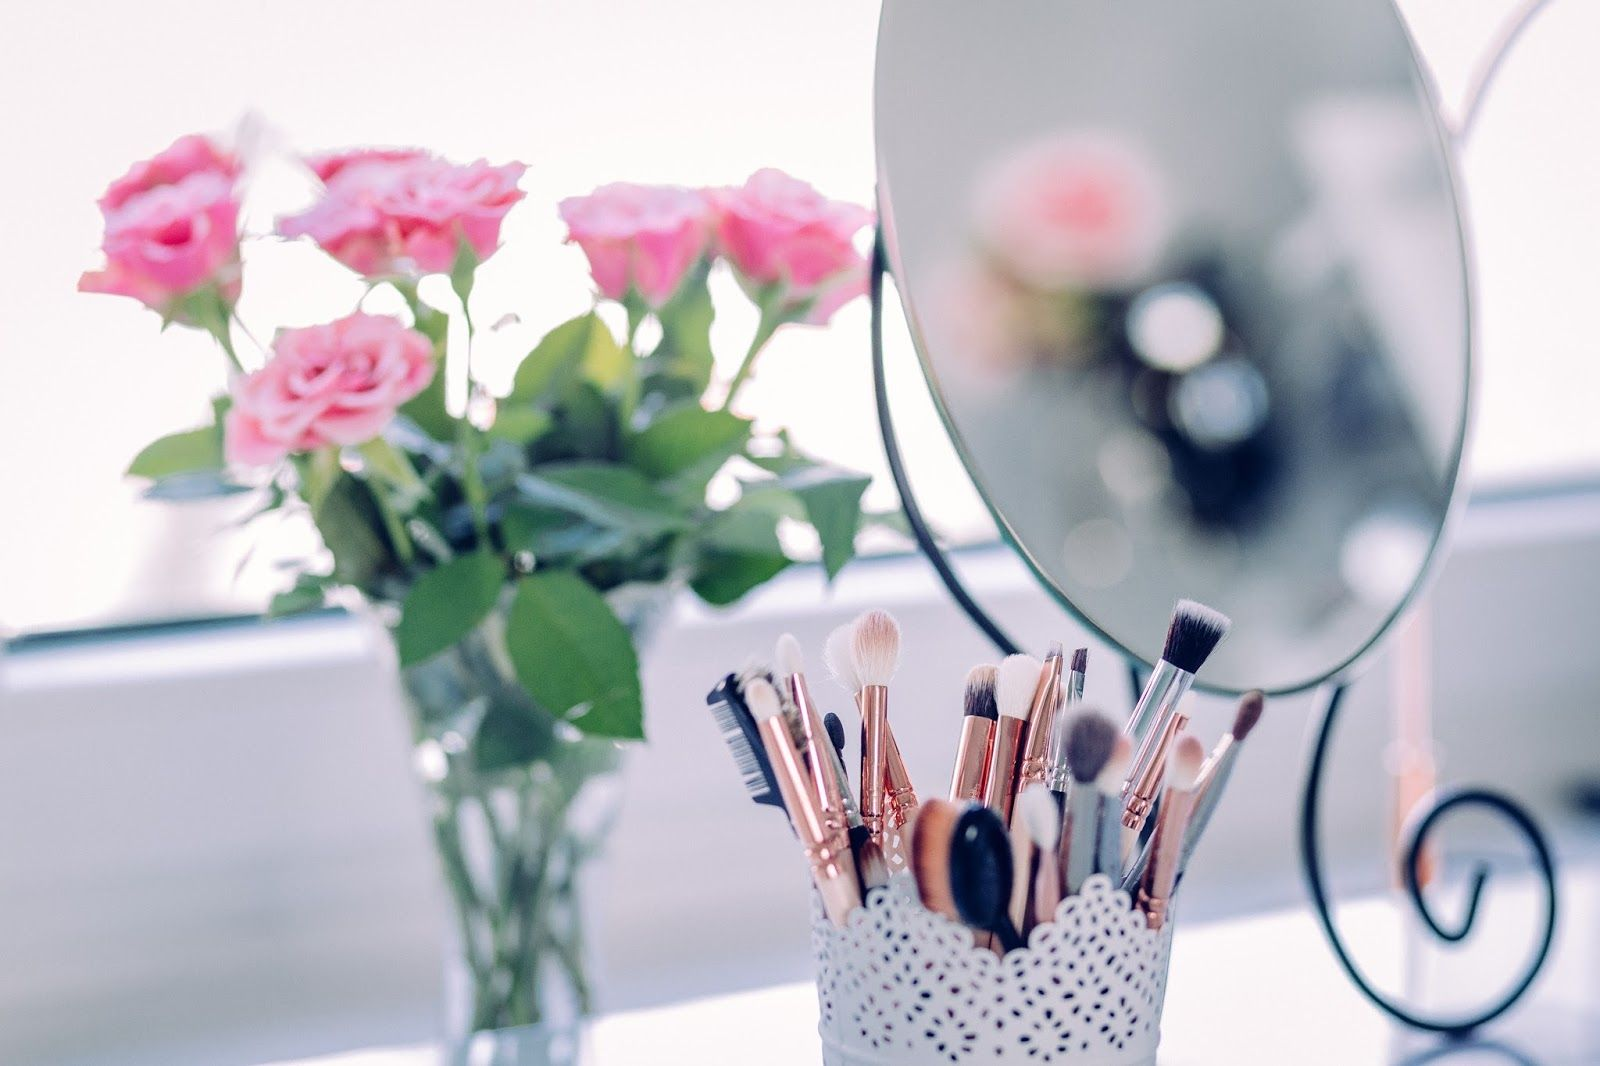 Carolina's Makeup Life : Tips I Wish I Knew When I Started Using Makeup